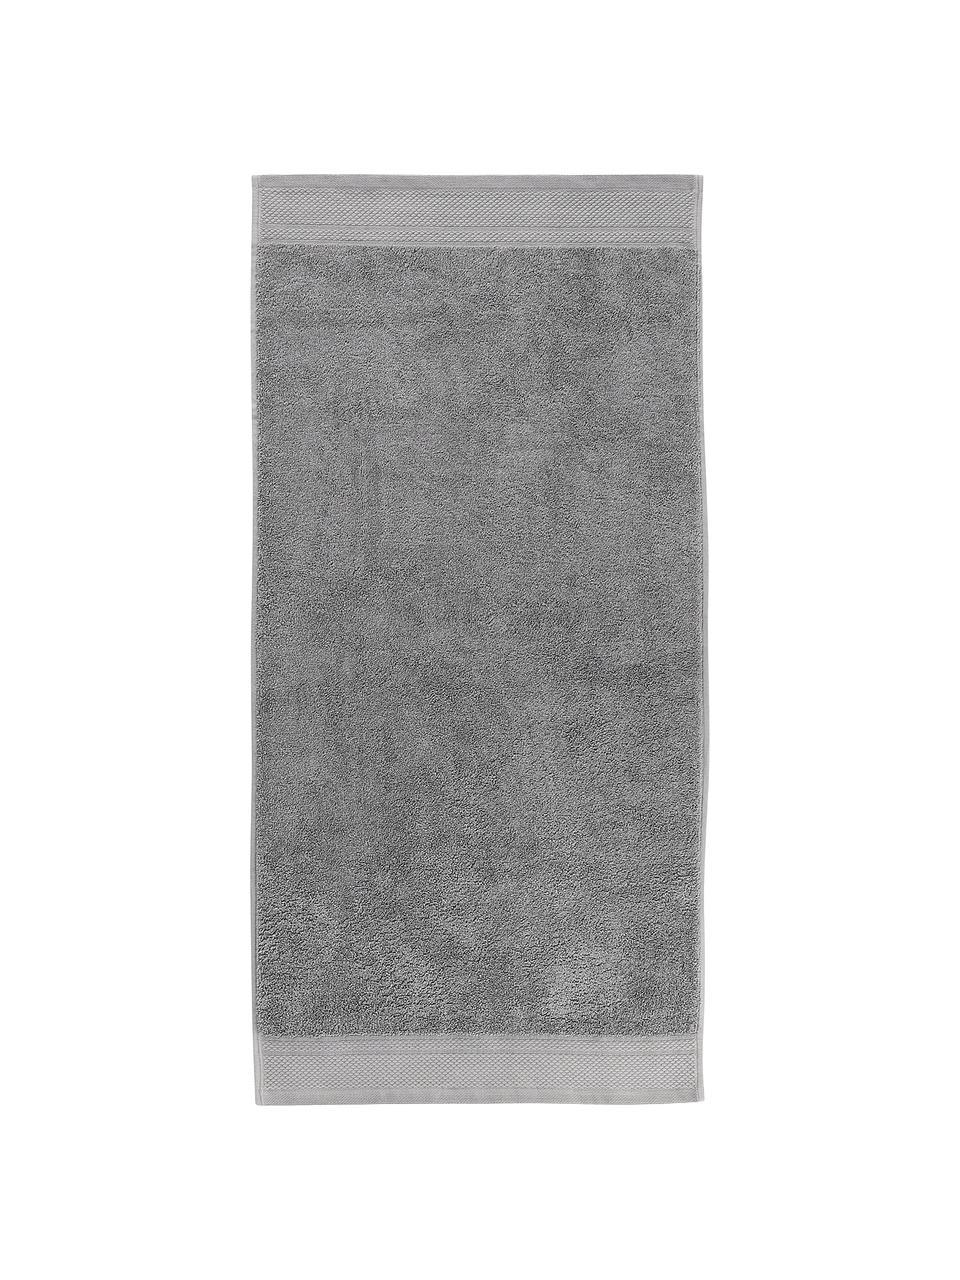 Set de toallas Premium, 3pzas., Gris oscuro, Set de diferentes tamaños